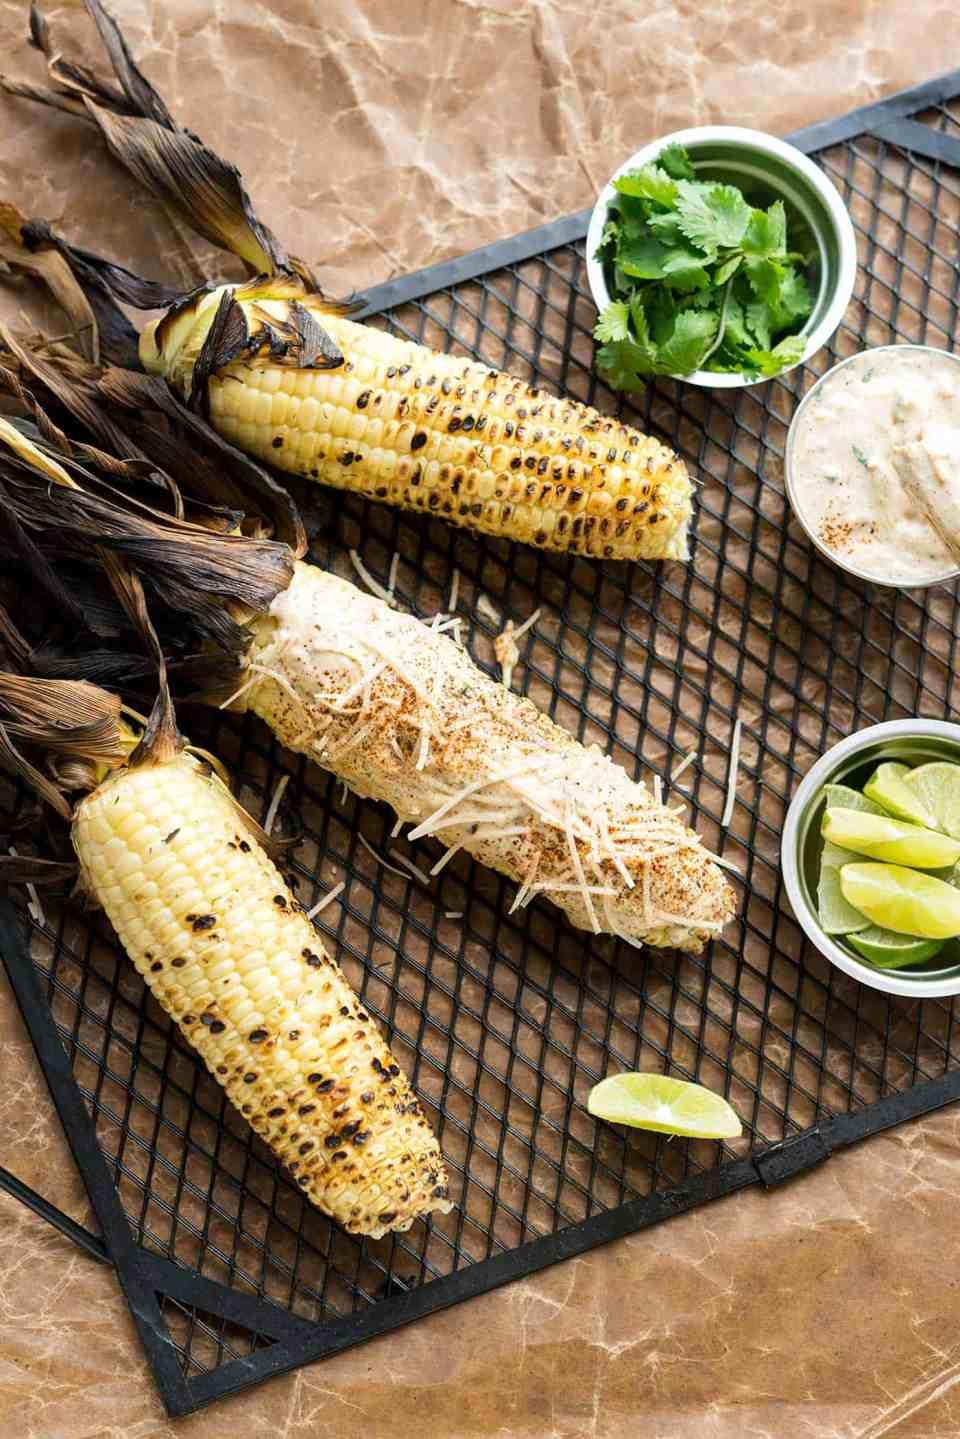 Street Fair Corn from the NYC Vegan Cookbook! Grilled corn slathered in a creamy sauce, vegan parmesan and lime juice. Yum! #glutenfree #dairyfree #vegan